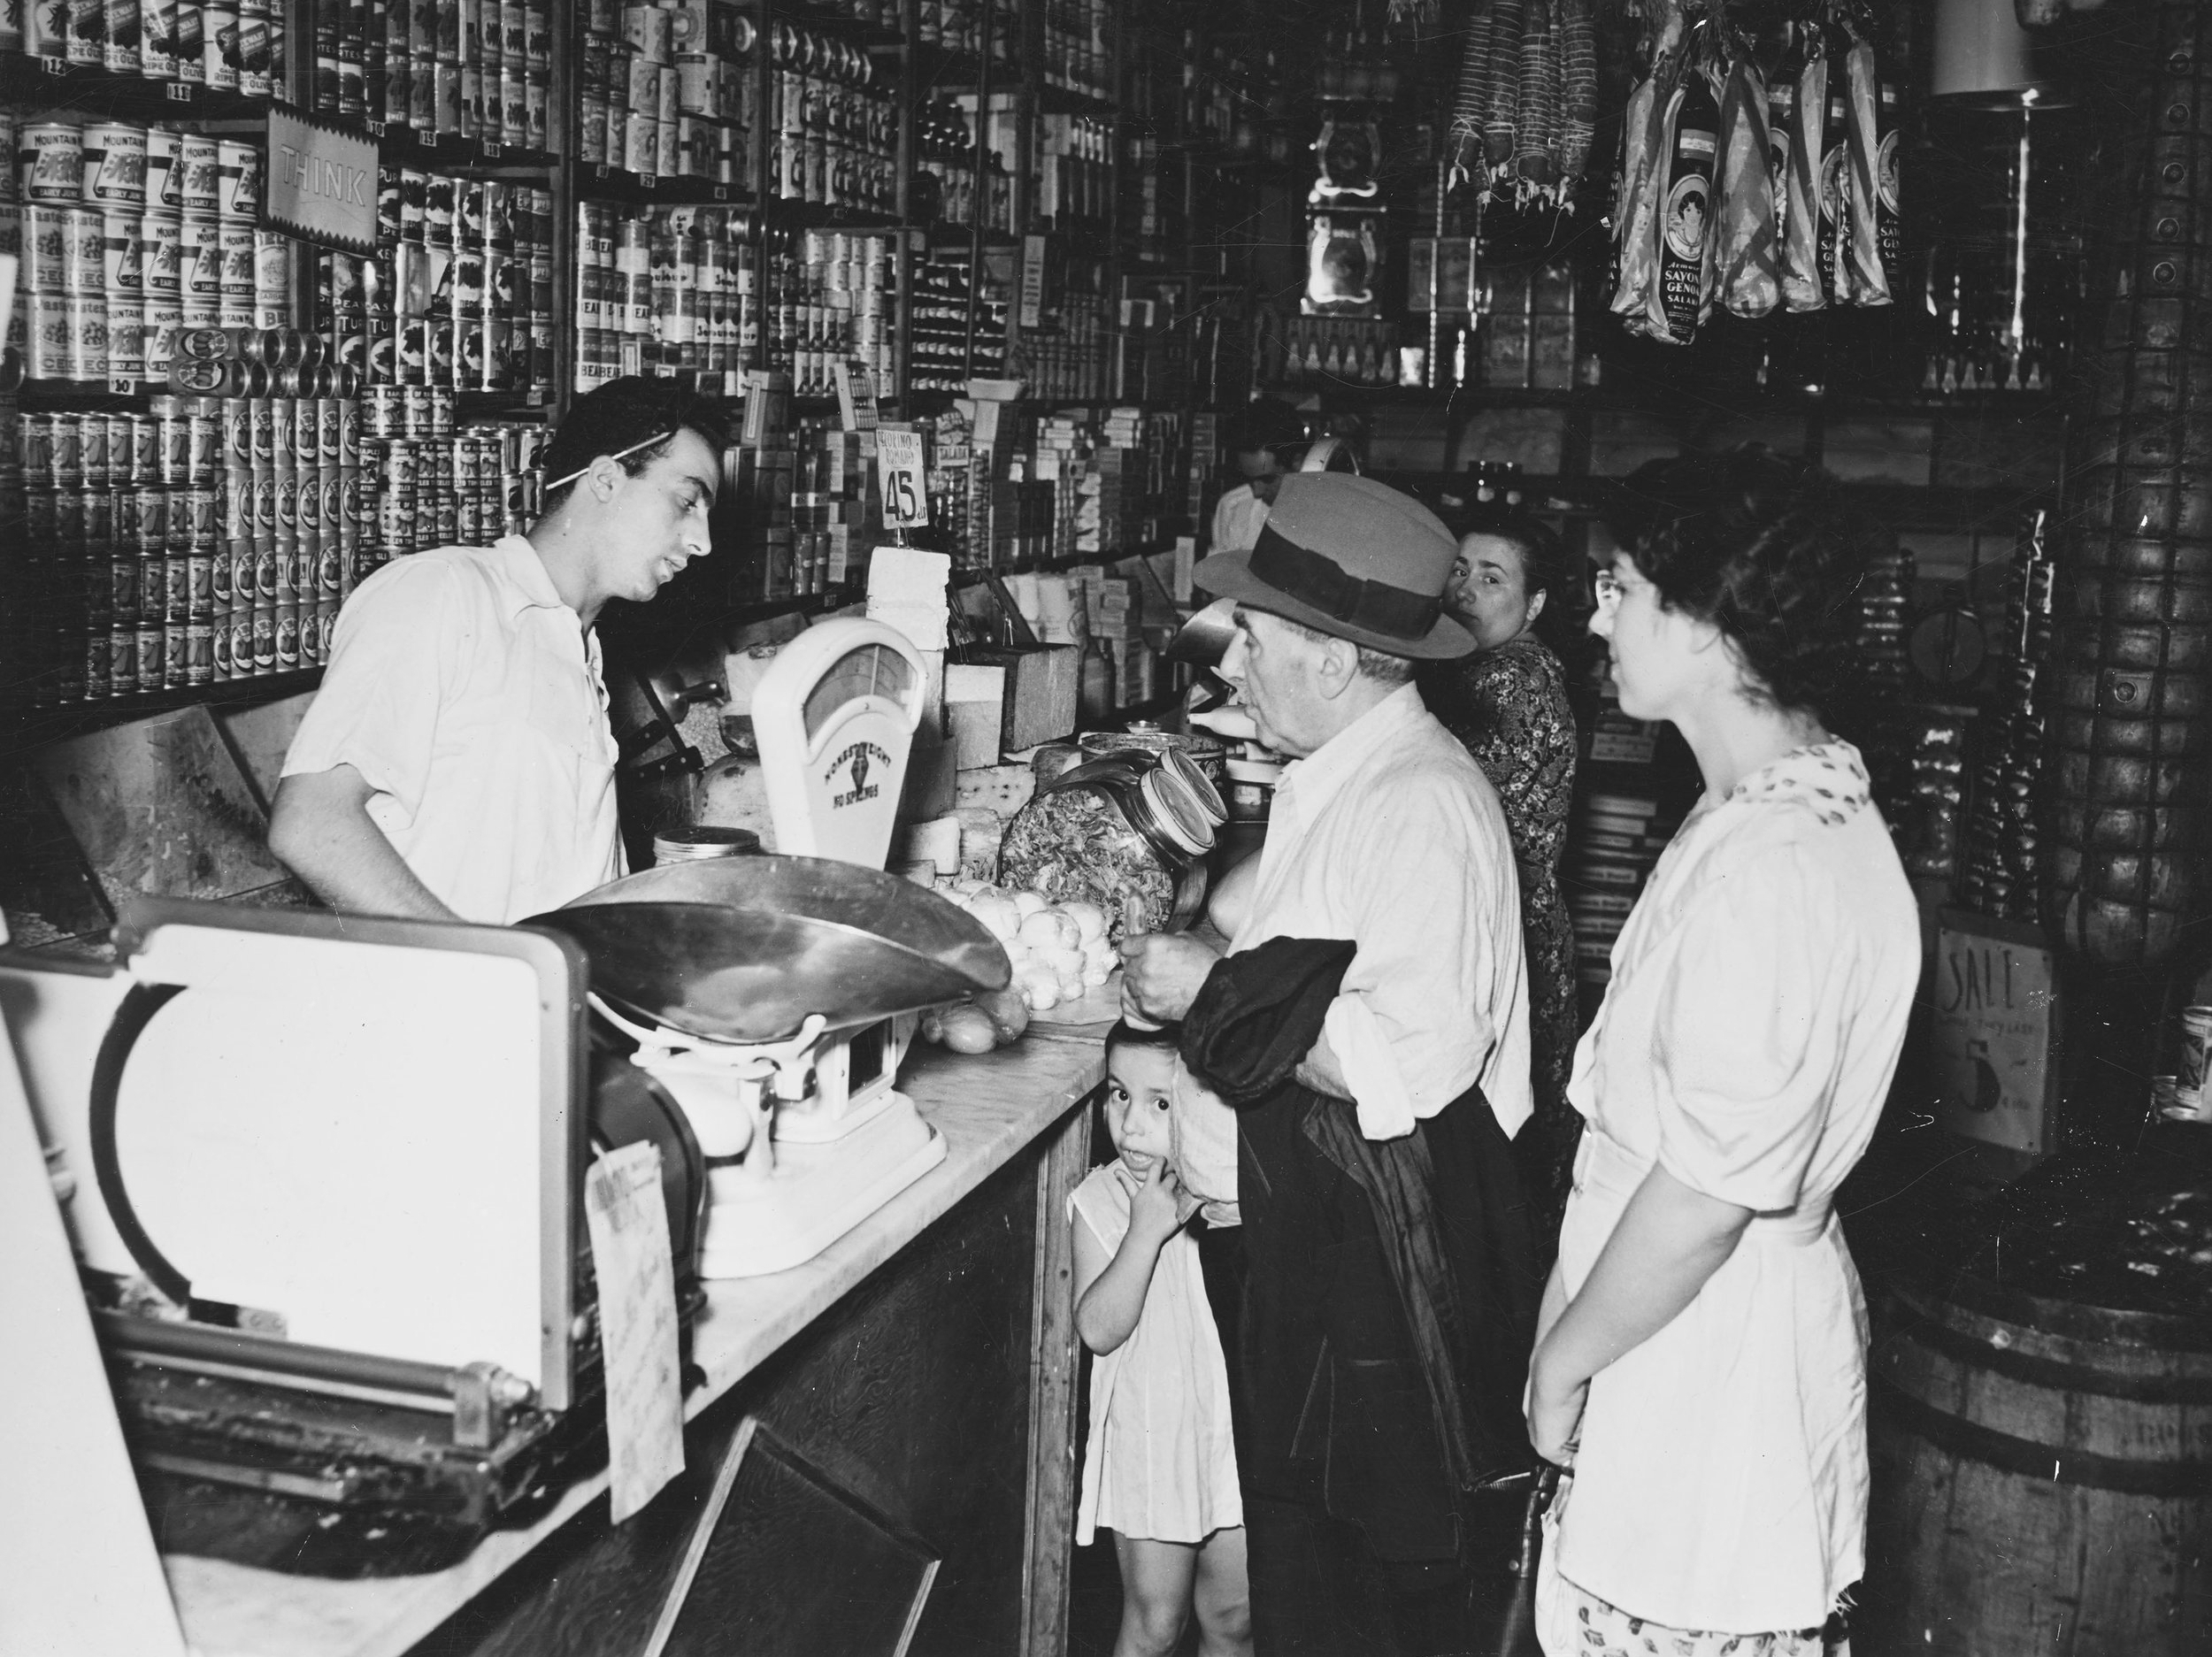 Italian grocery store, 1937.  WPA FWP Shop Interiors, #10  Photograph by Ezzes. WPA Art Project, neg. no. 2449-6.